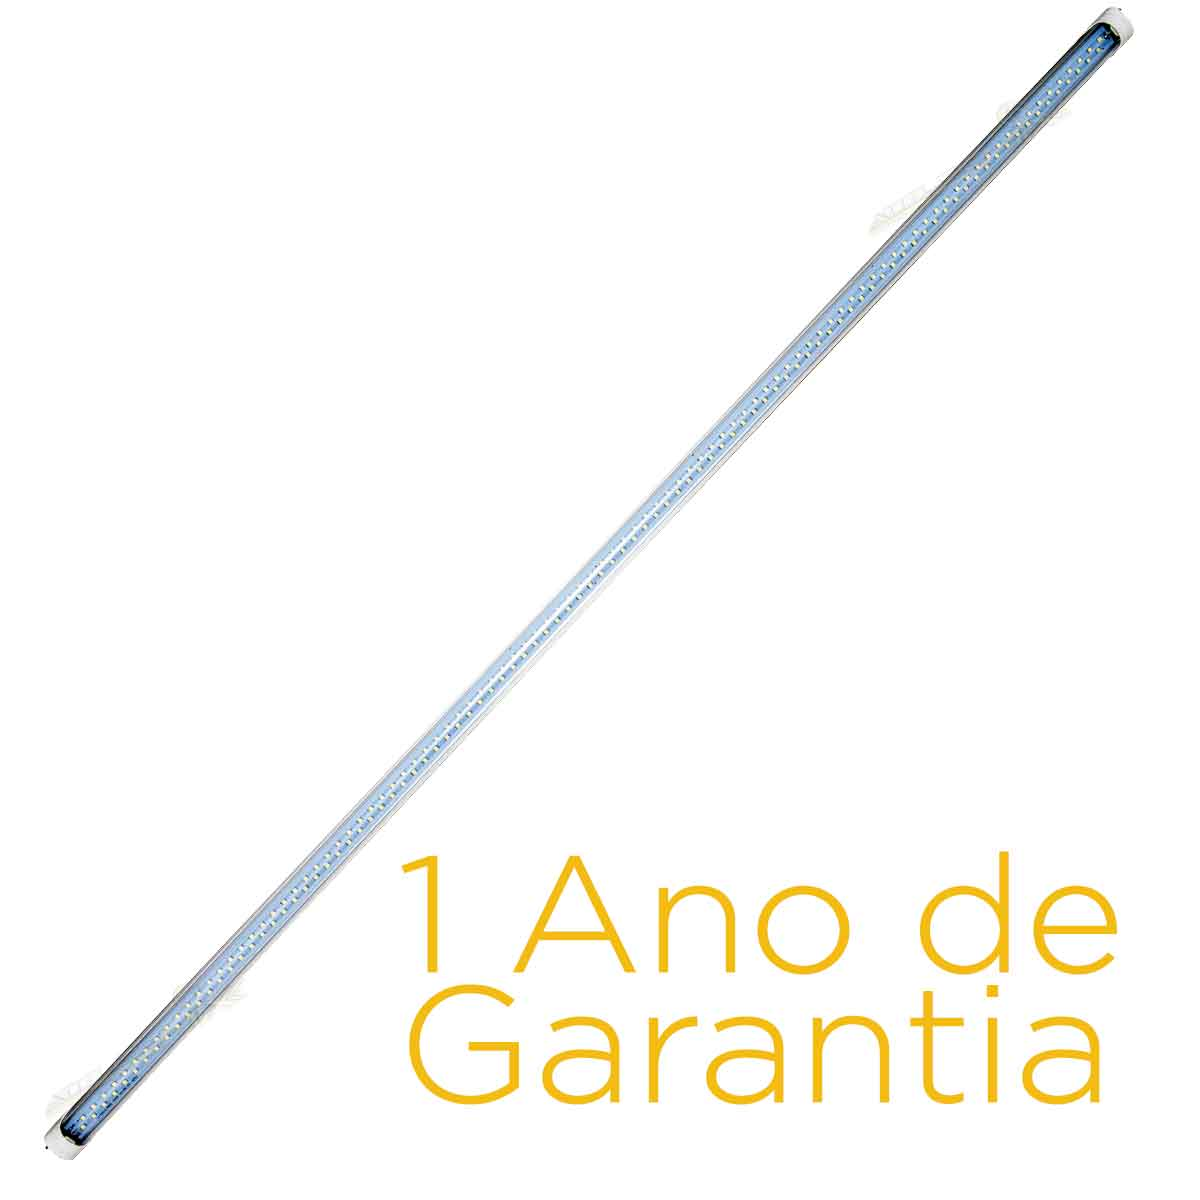 Lâmpada Led Tubular 120cm T8 18w Branco Tubo Nota Fiscal